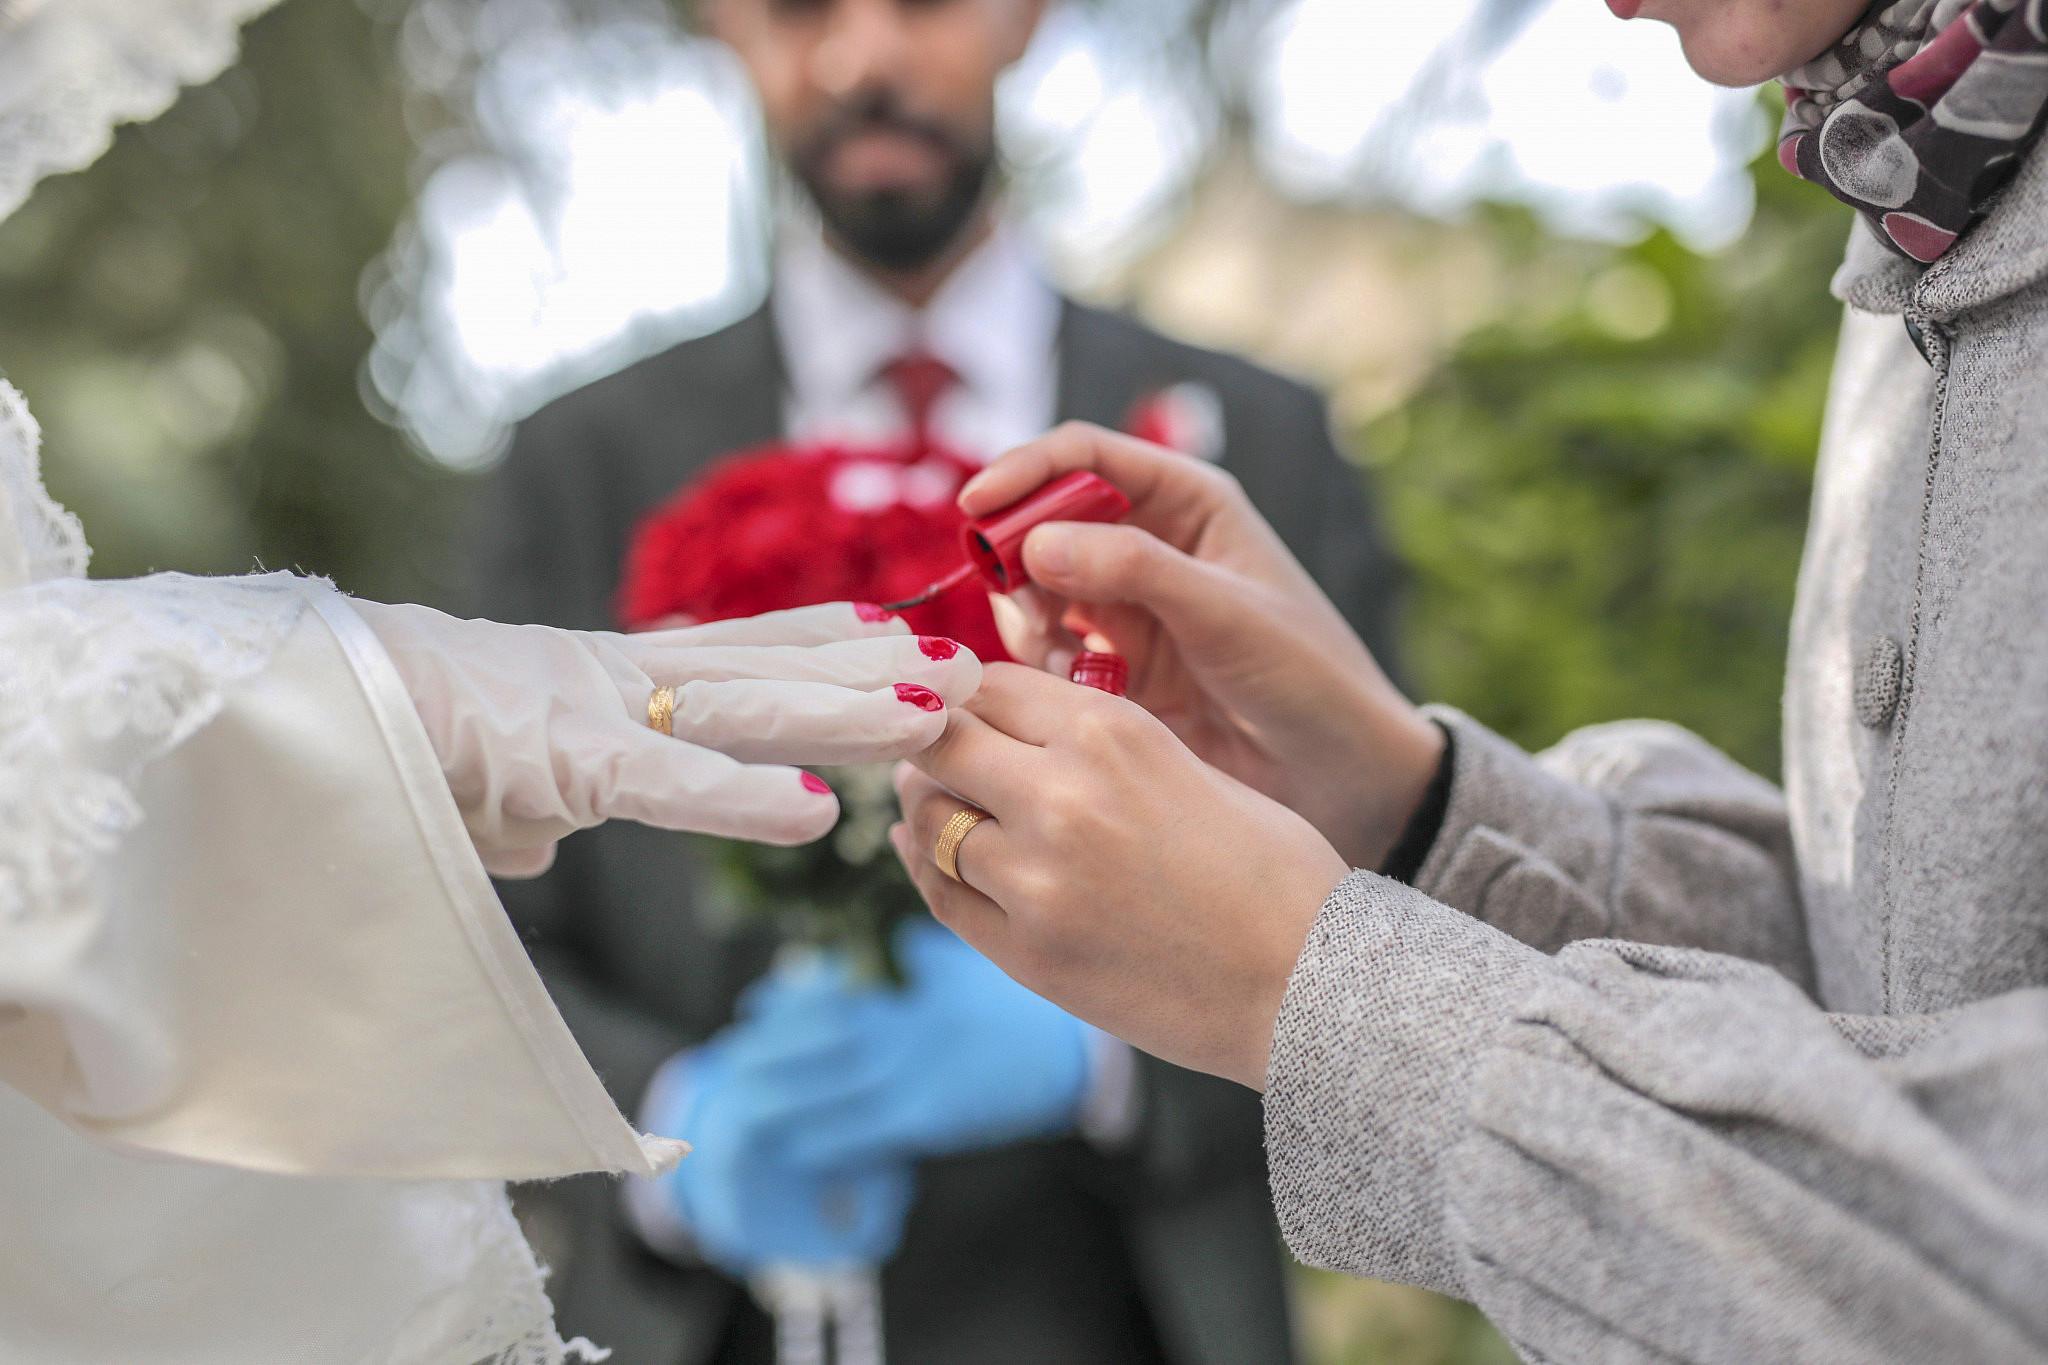 Ali and Narmeen Abu Seif on their wedding day, Gaza City, April 10, 2020. (Mohammed Zaanoun)